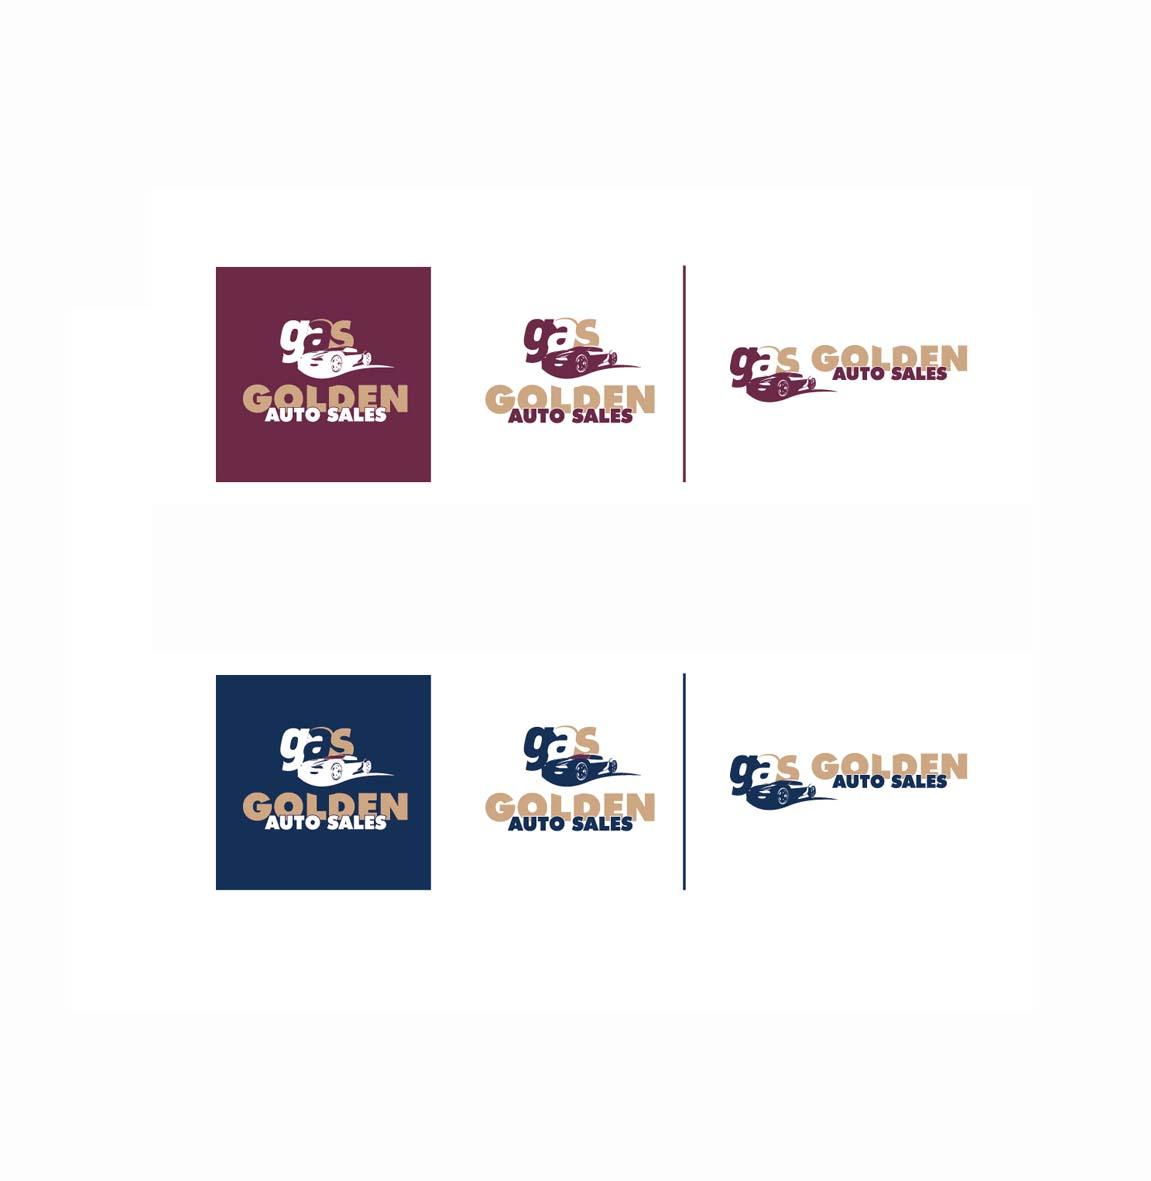 Professional, Masculine, Car Dealer Logo Design for Golden Auto